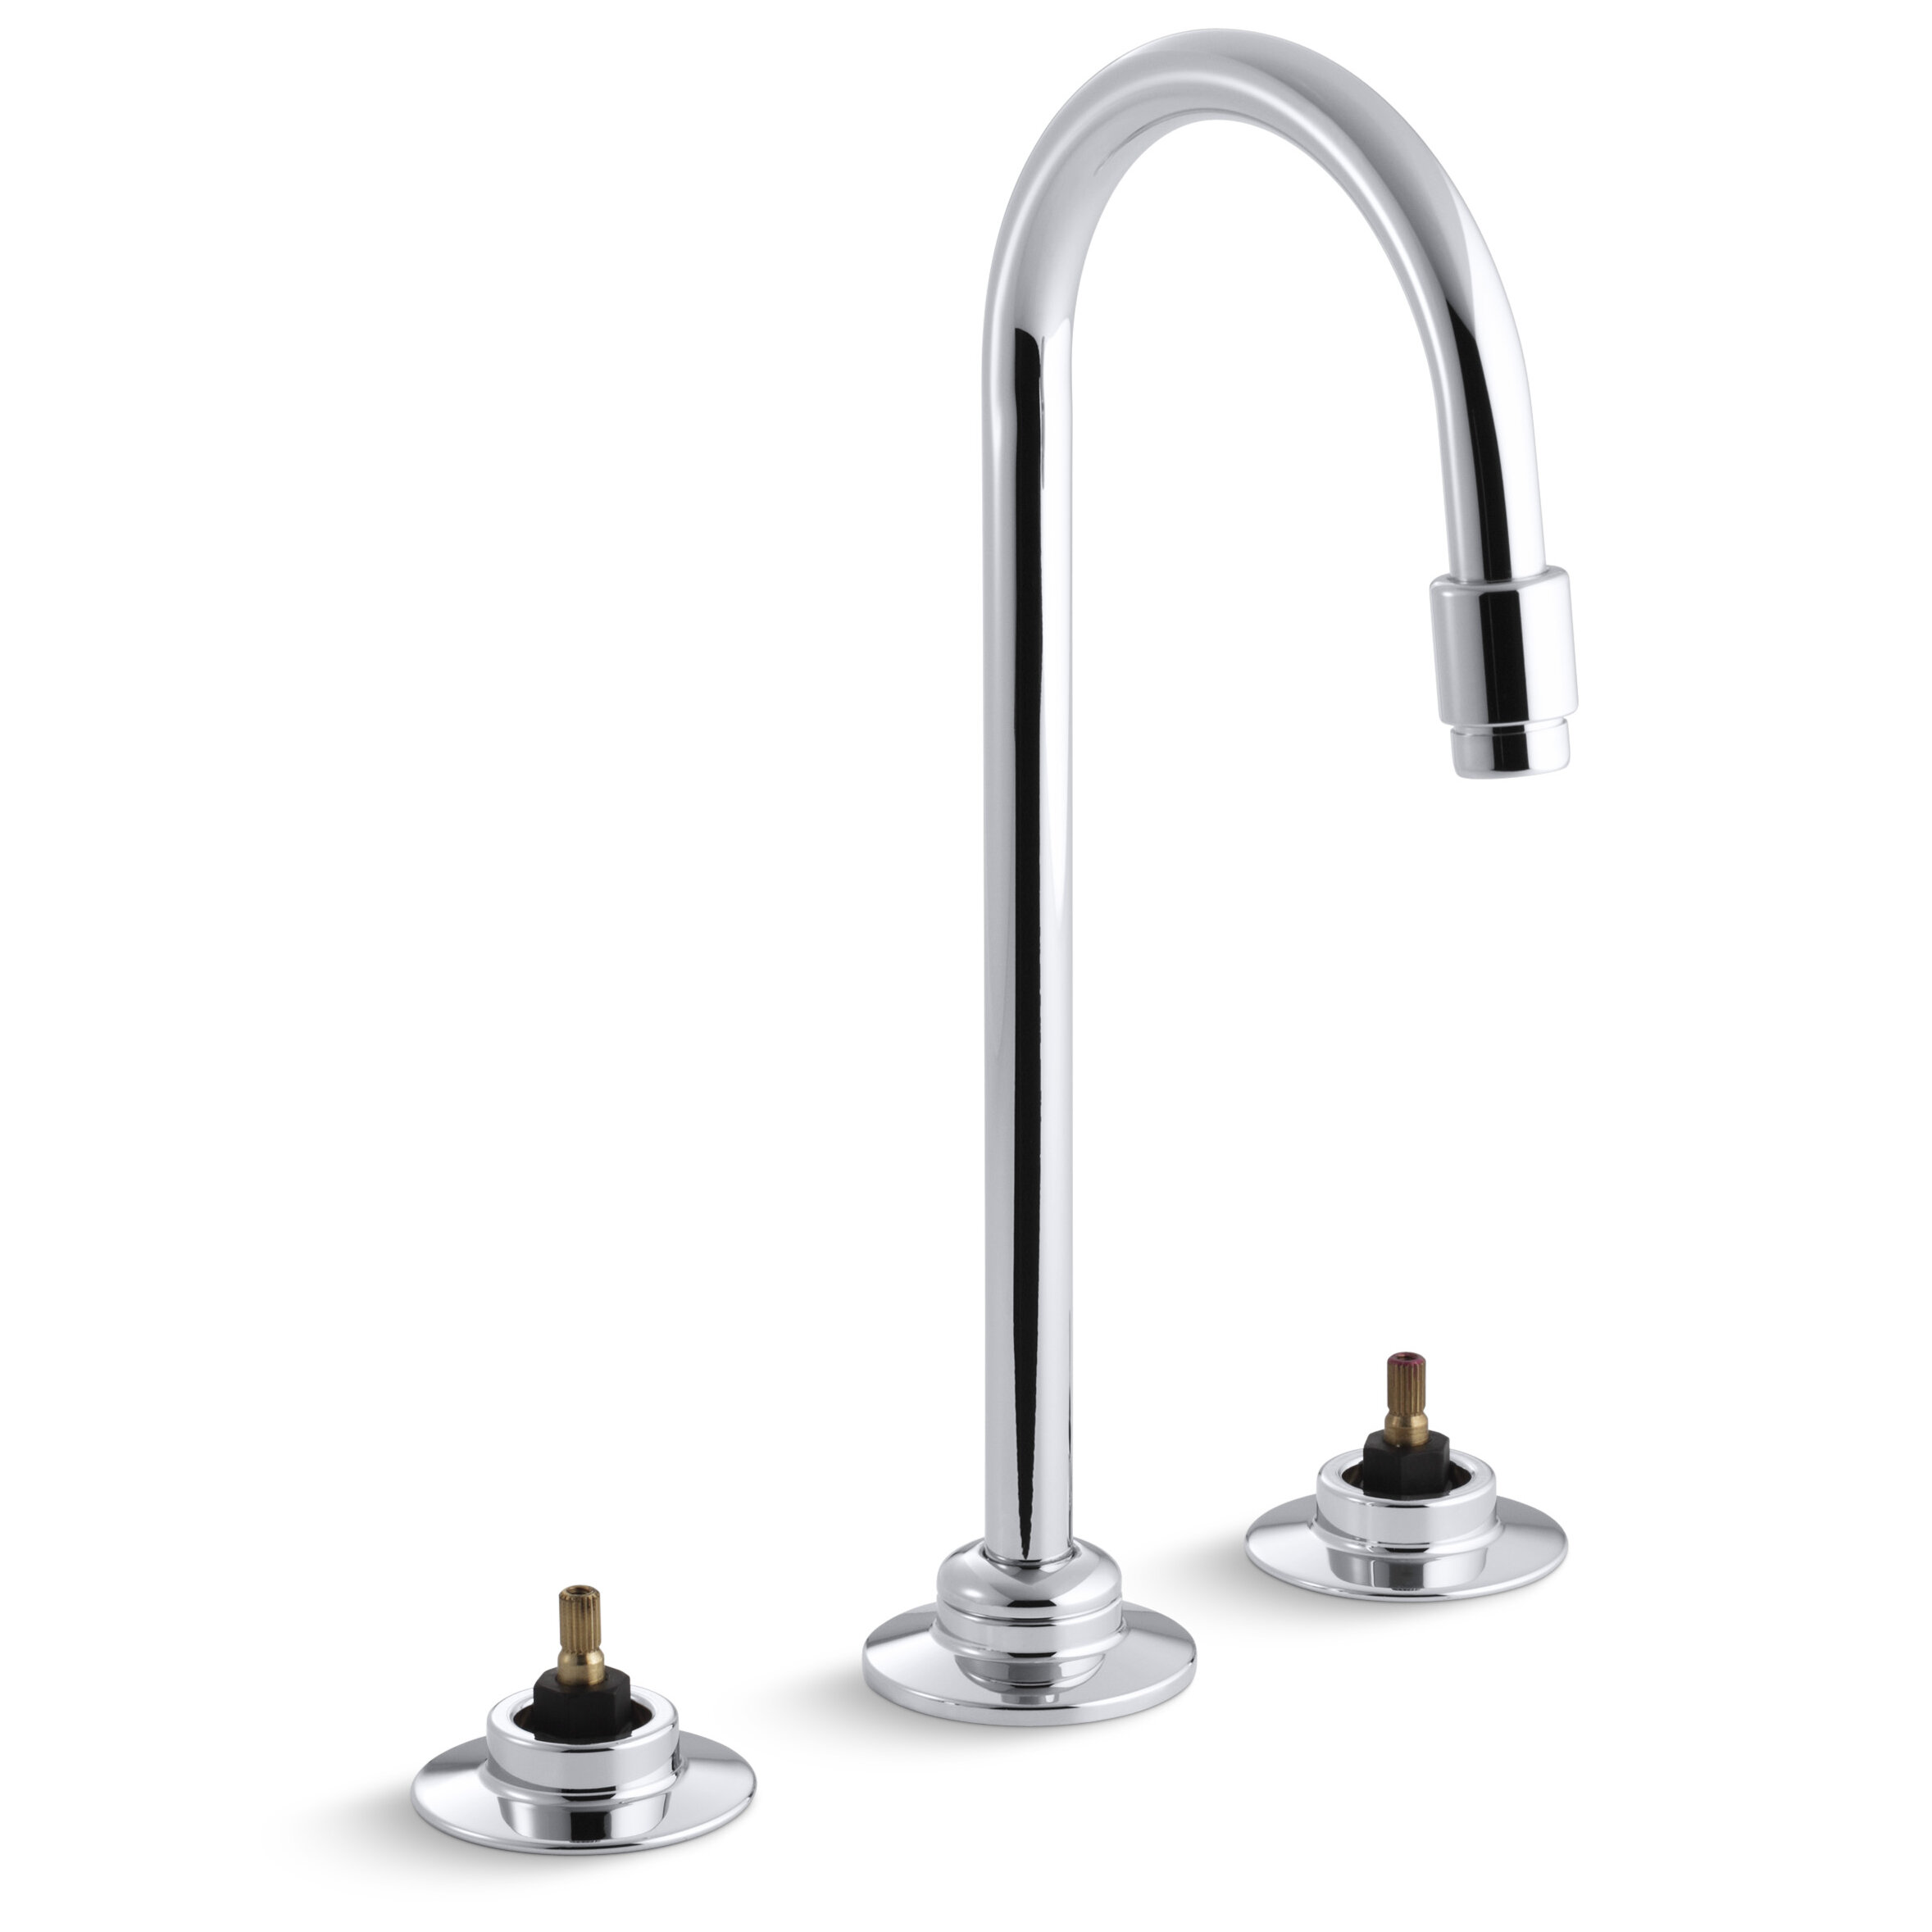 Kohler Triton Widespread Commercial Bathroom Sink Faucet With Flexible Connections And Gooseneck Spout Requires Handles Wayfair